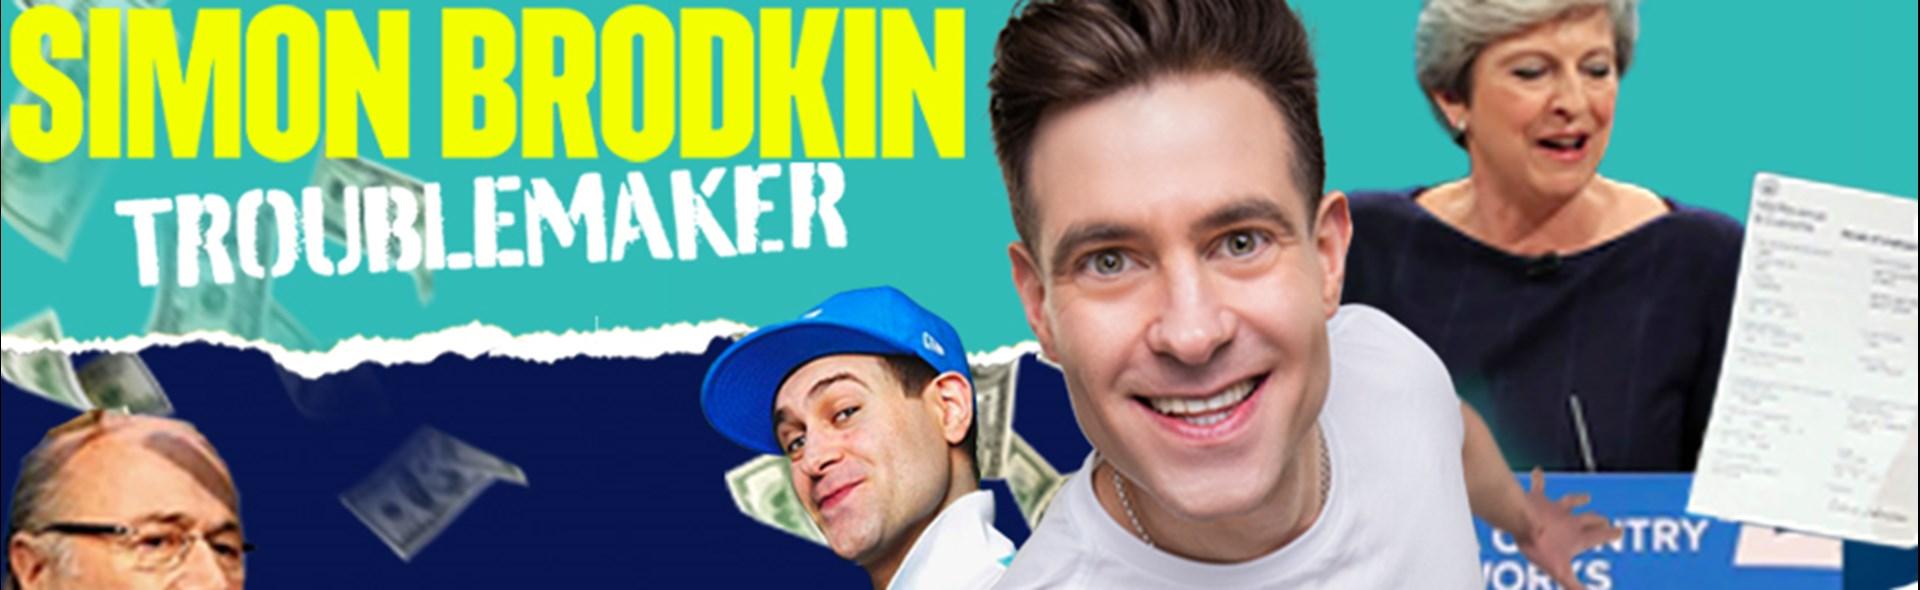 Simon Brodkin: Troublemaker